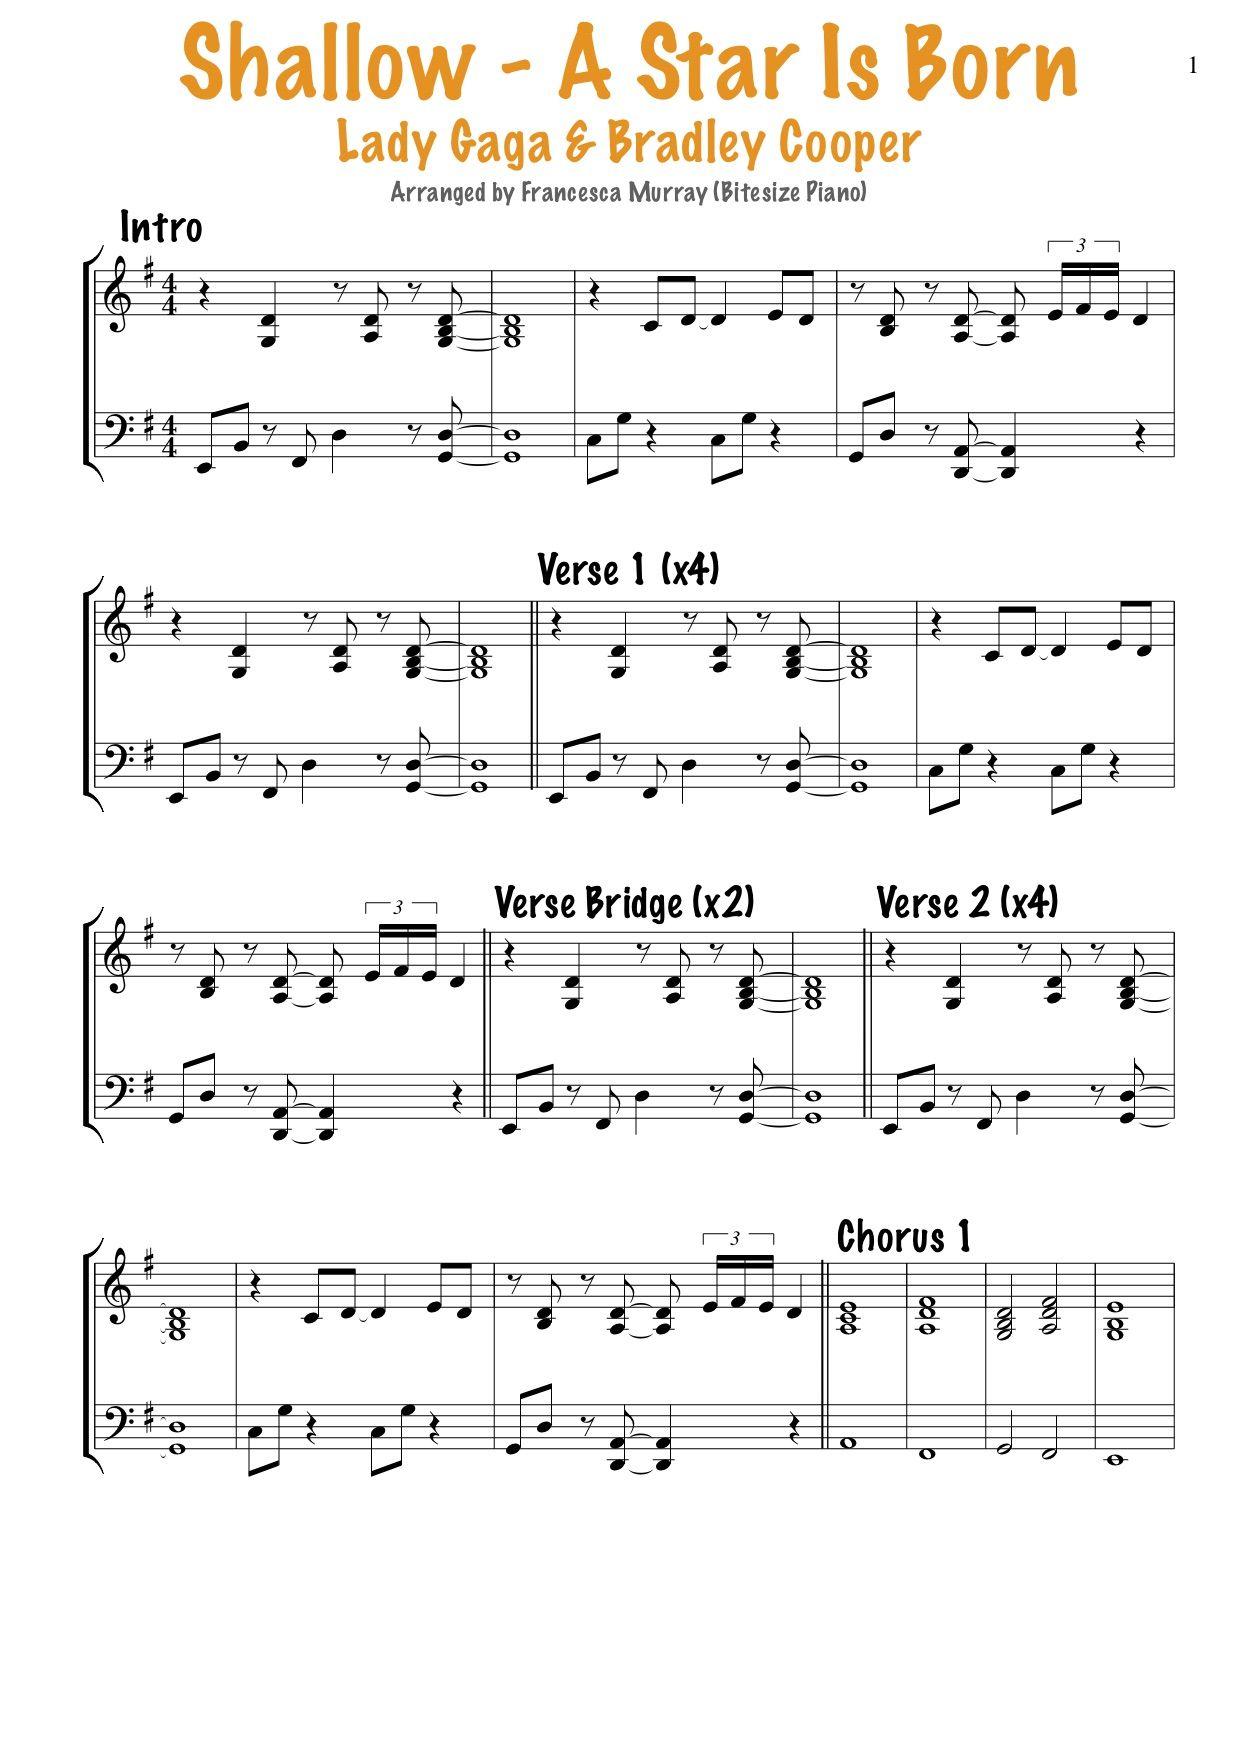 480 Music Lover Ideas Sheet Music Music Lovers Piano Music